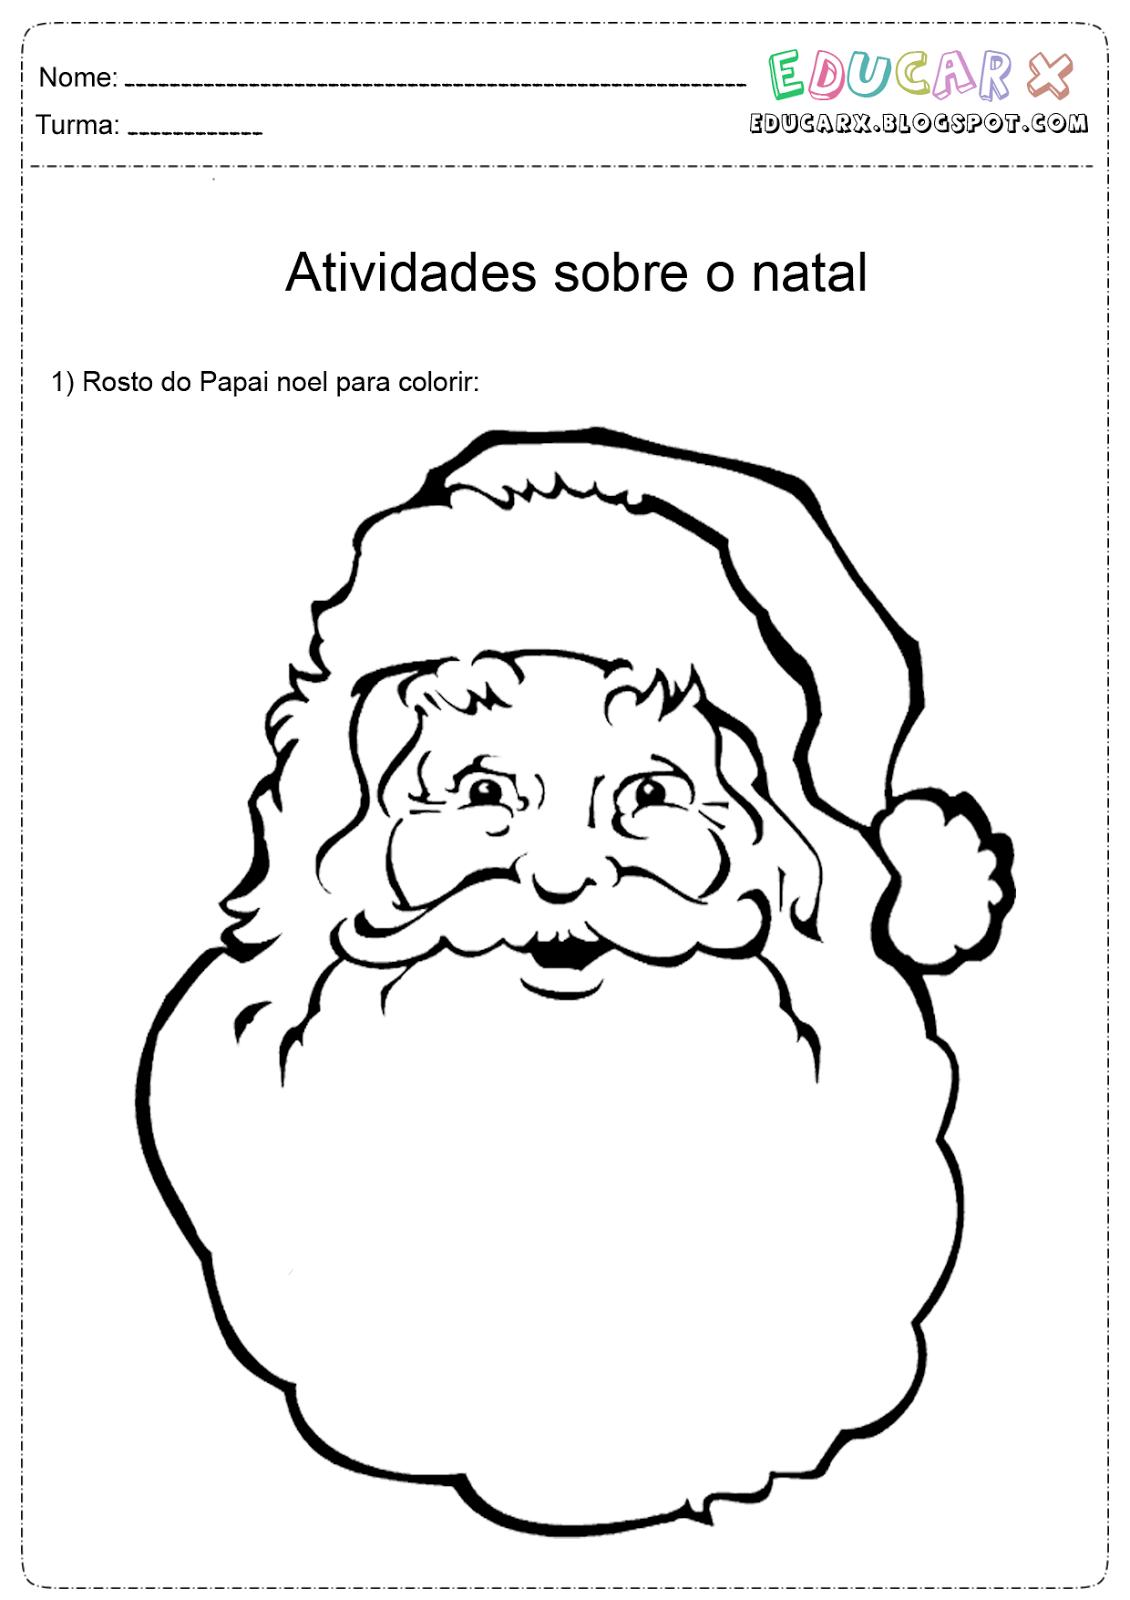 Atividades Escolares  Rosto De Papai Noel Para Colorir E Imprimir